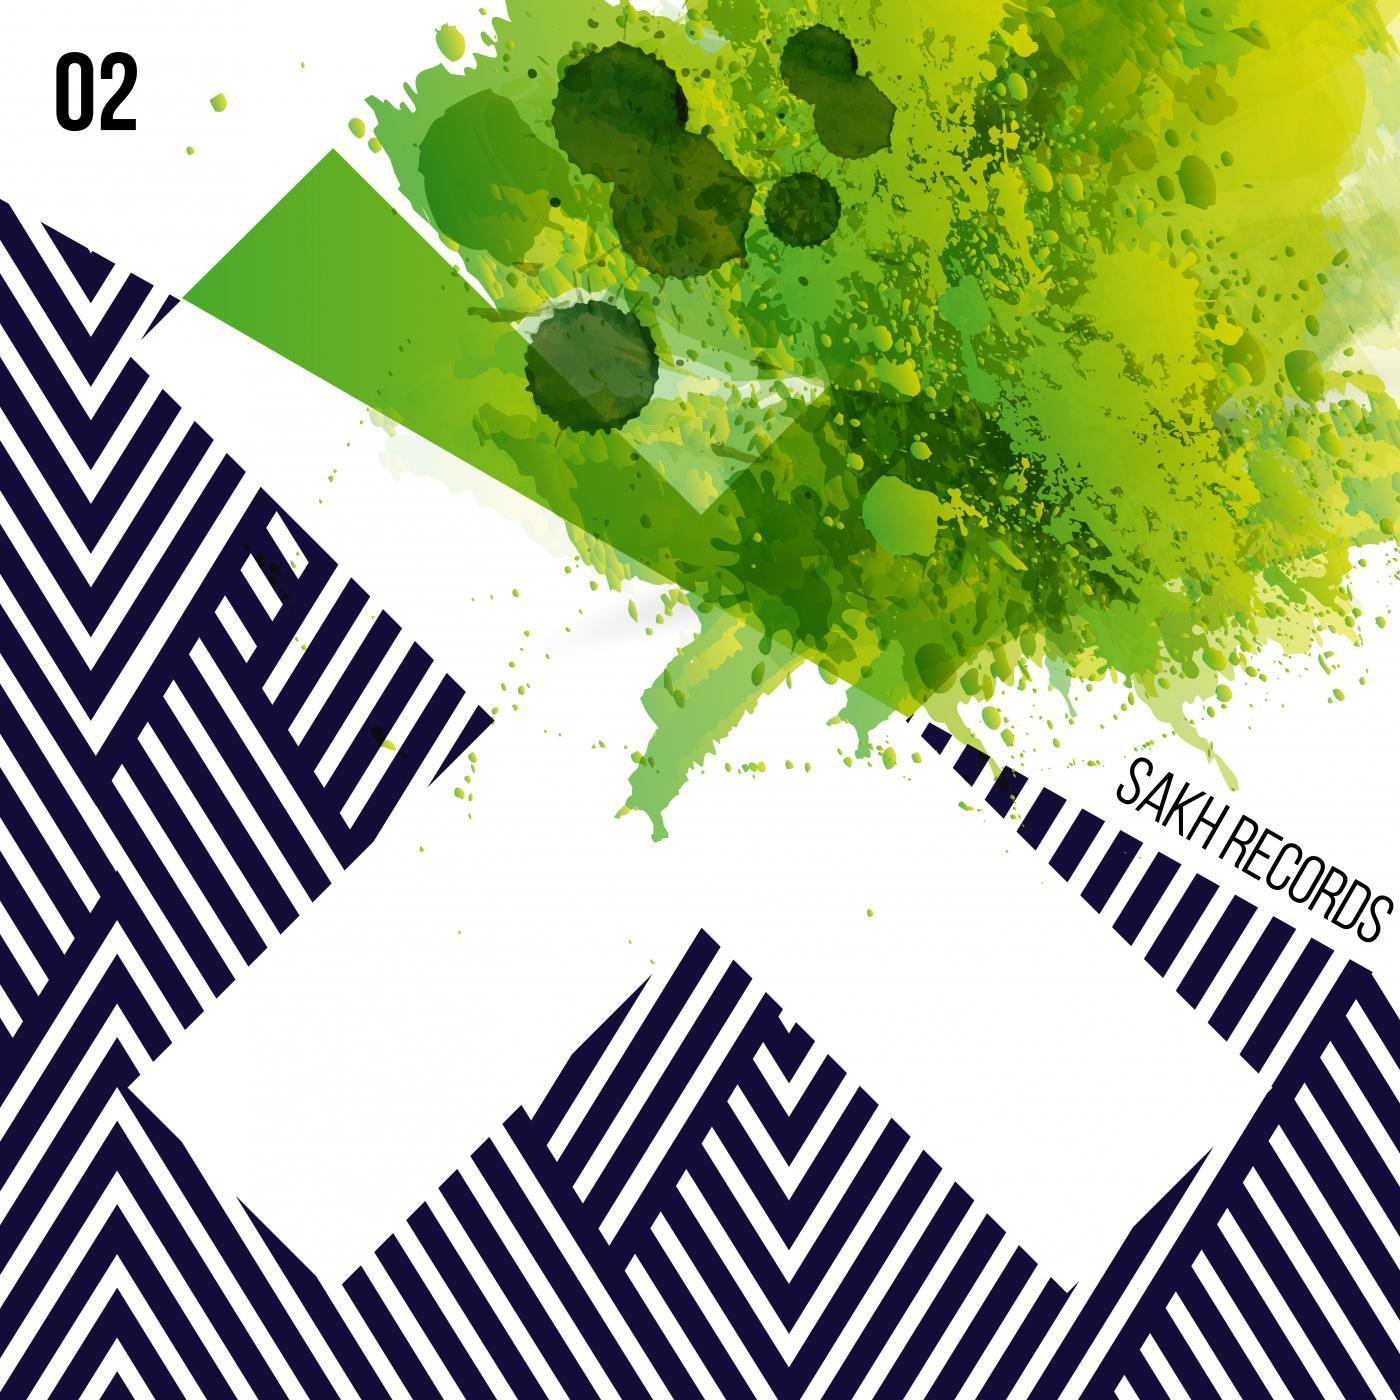 DJ Eledro - Last Breath (Original Mix)